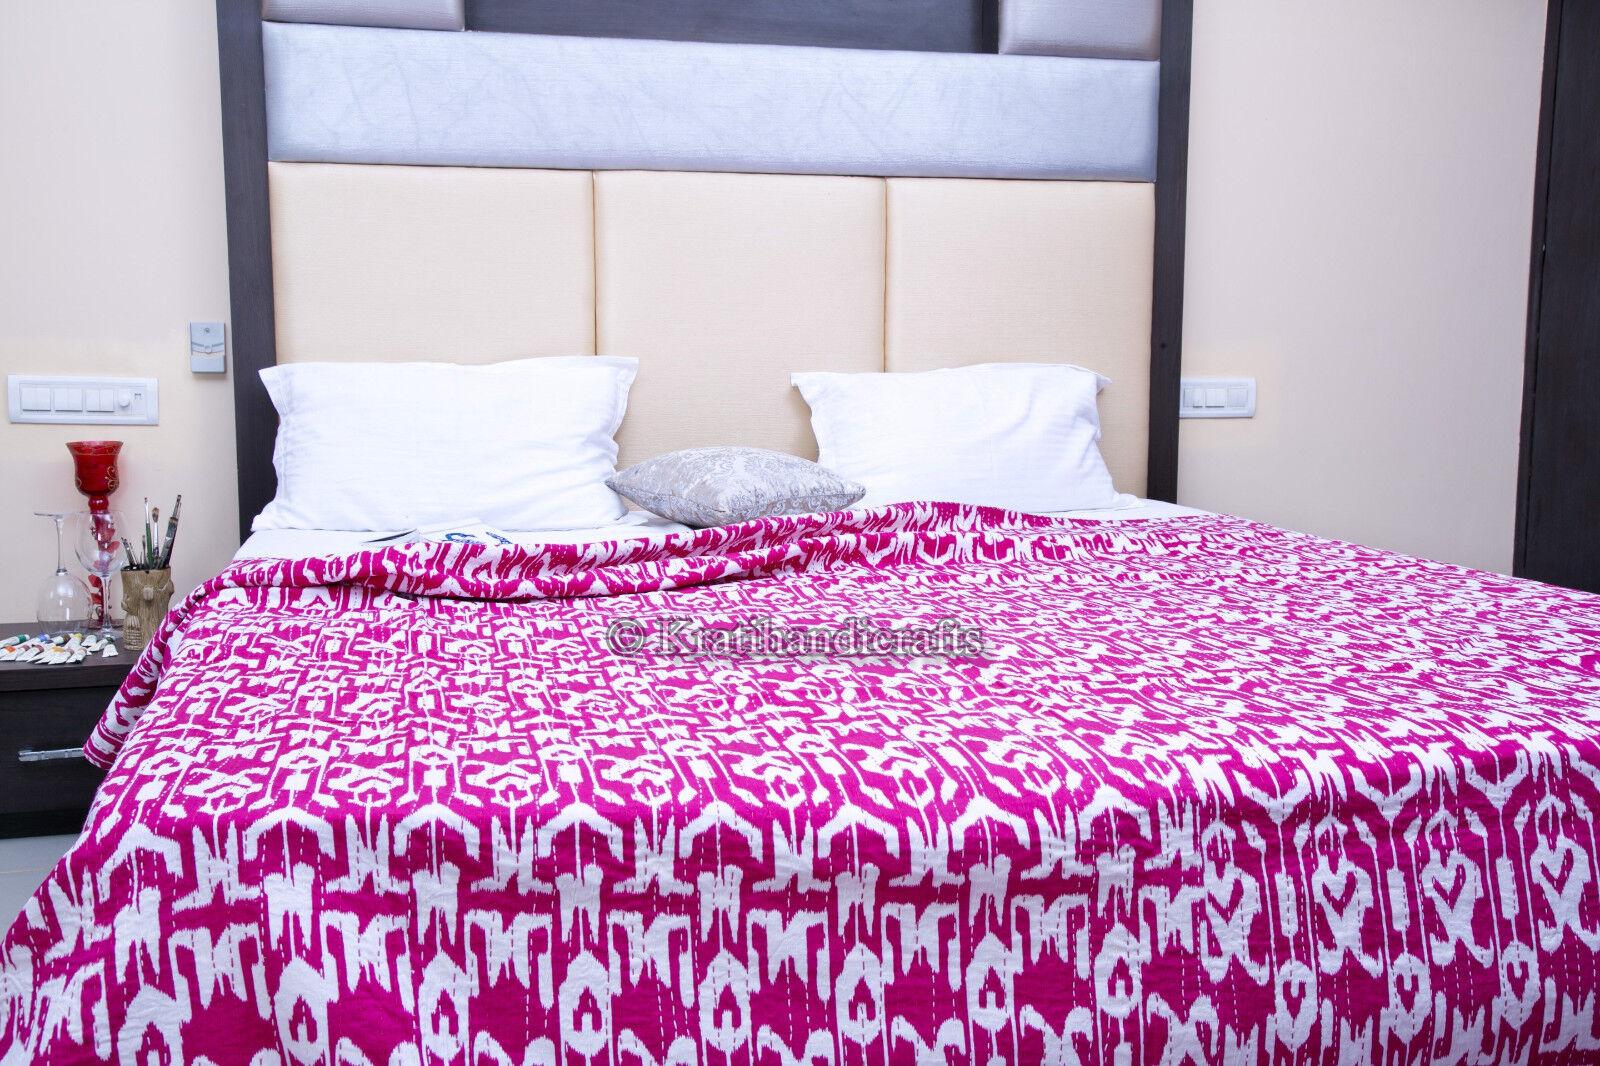 Gypsy Blanket Indian Handmade Kantha Quilt Bohemian Boho Ralli Bedspread Gudri